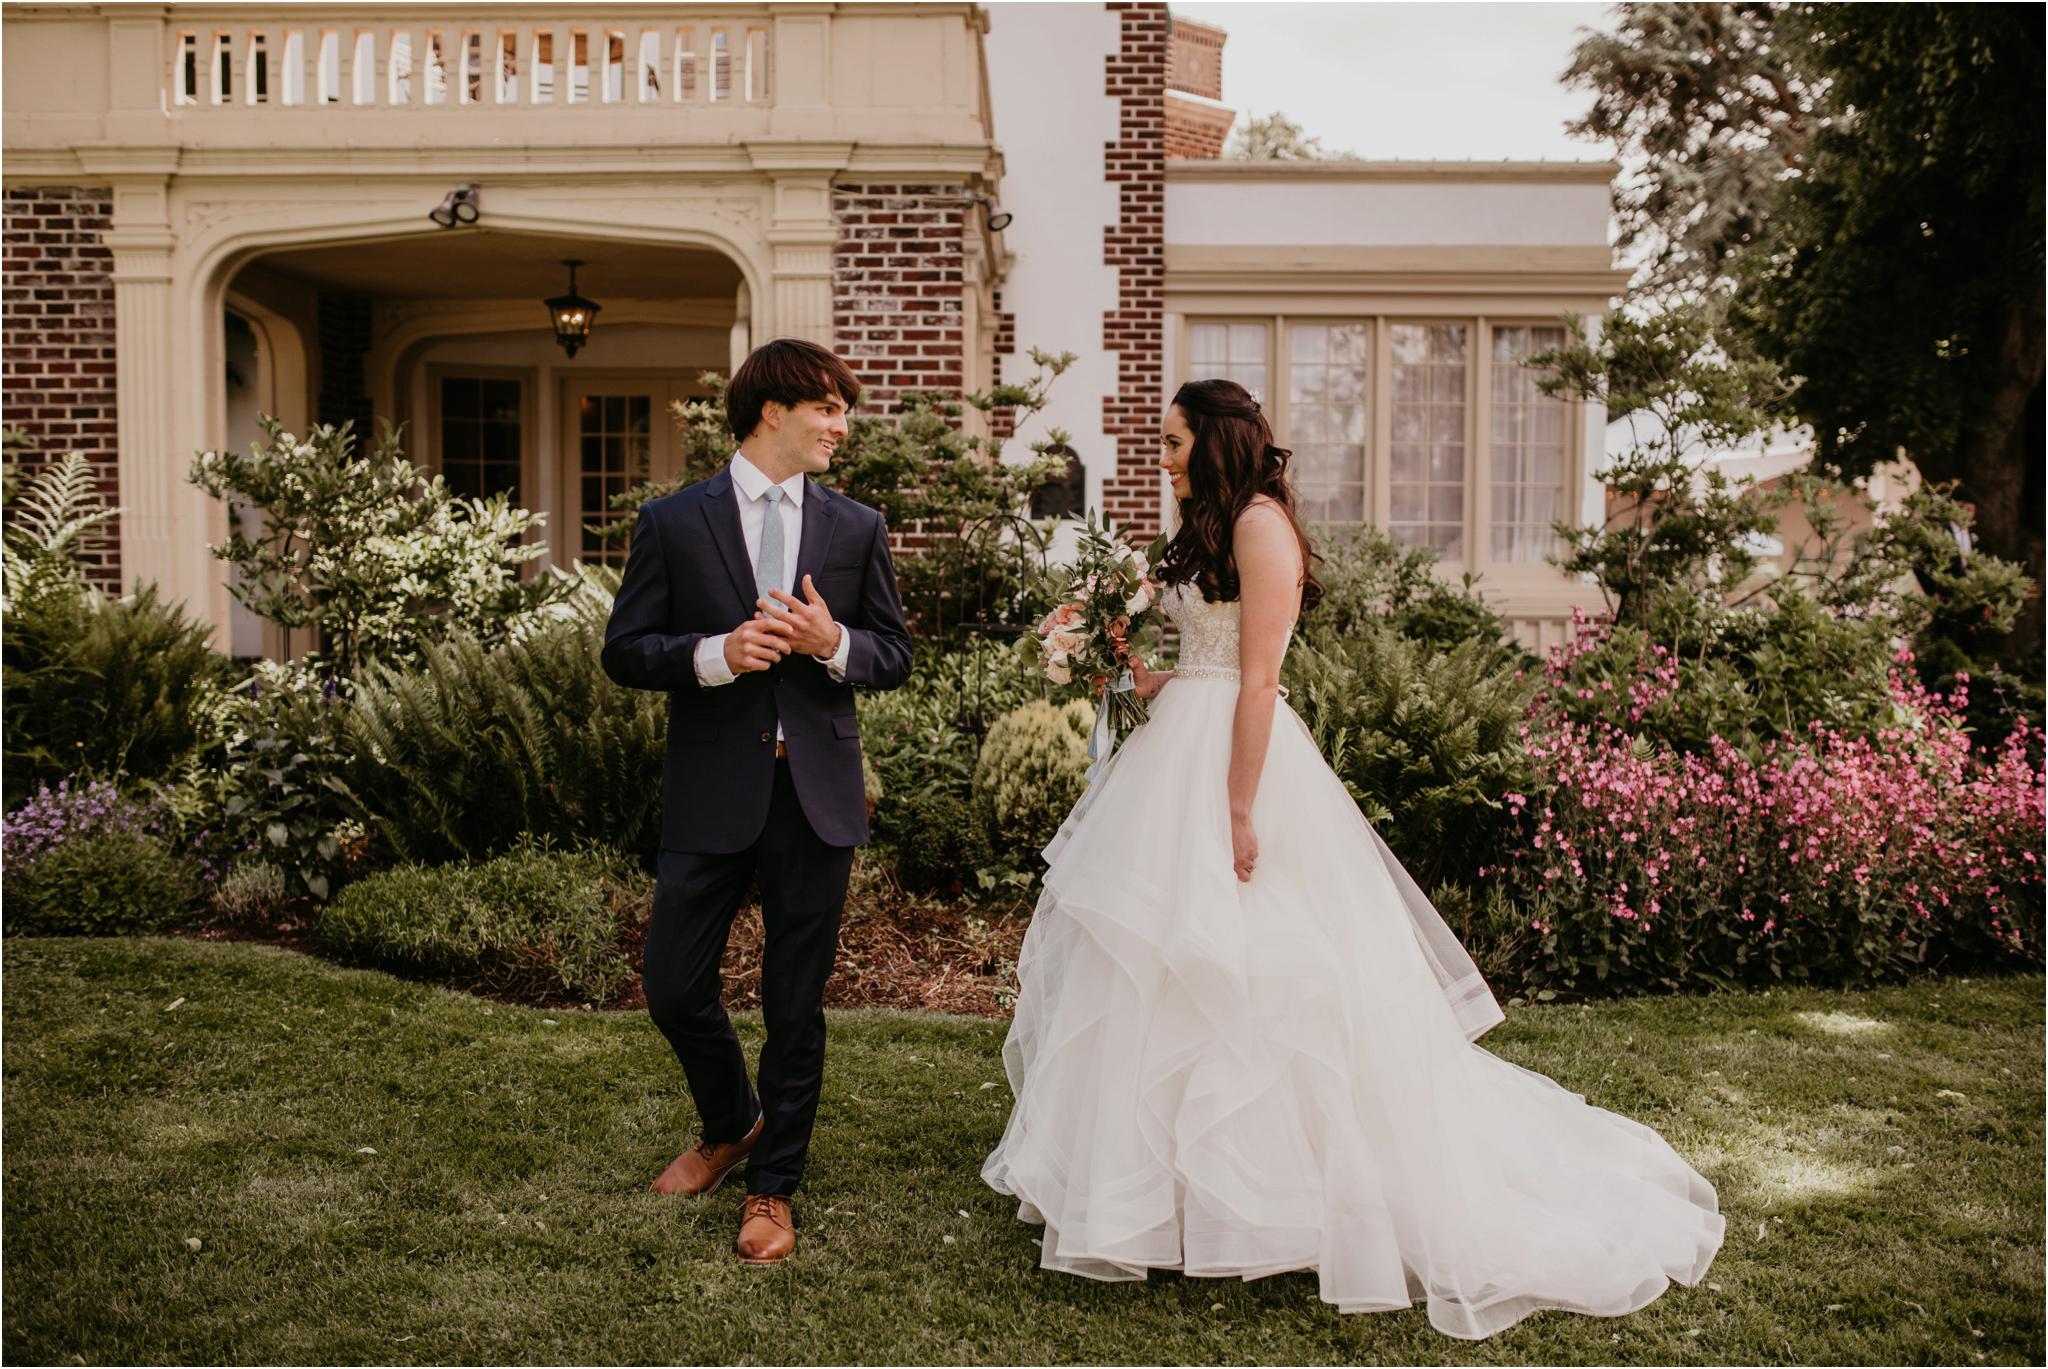 chance-and-ondrea-lairmont-manor-wedding-seattle-photographer-029.jpg